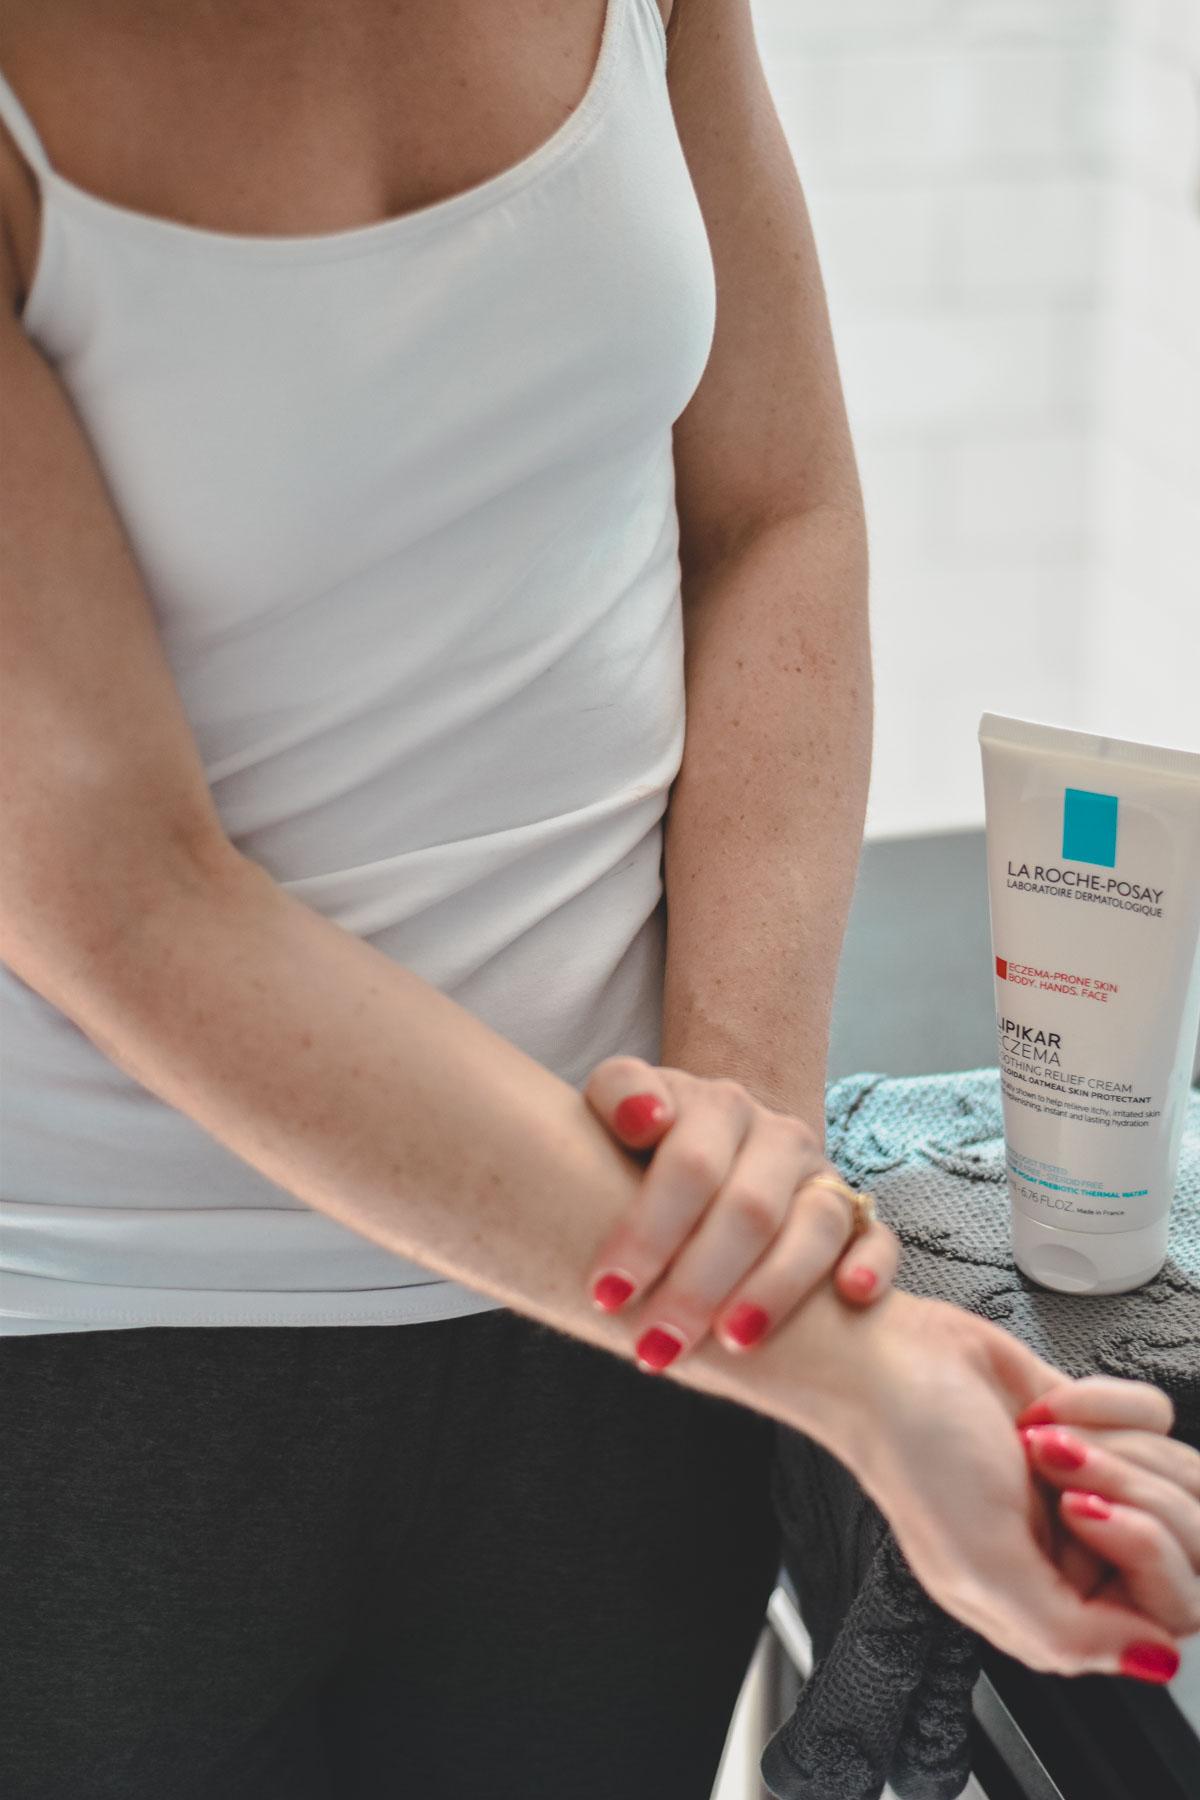 La Roche-Posay USA Lipikar Eczema Cream • The Audrey Reel